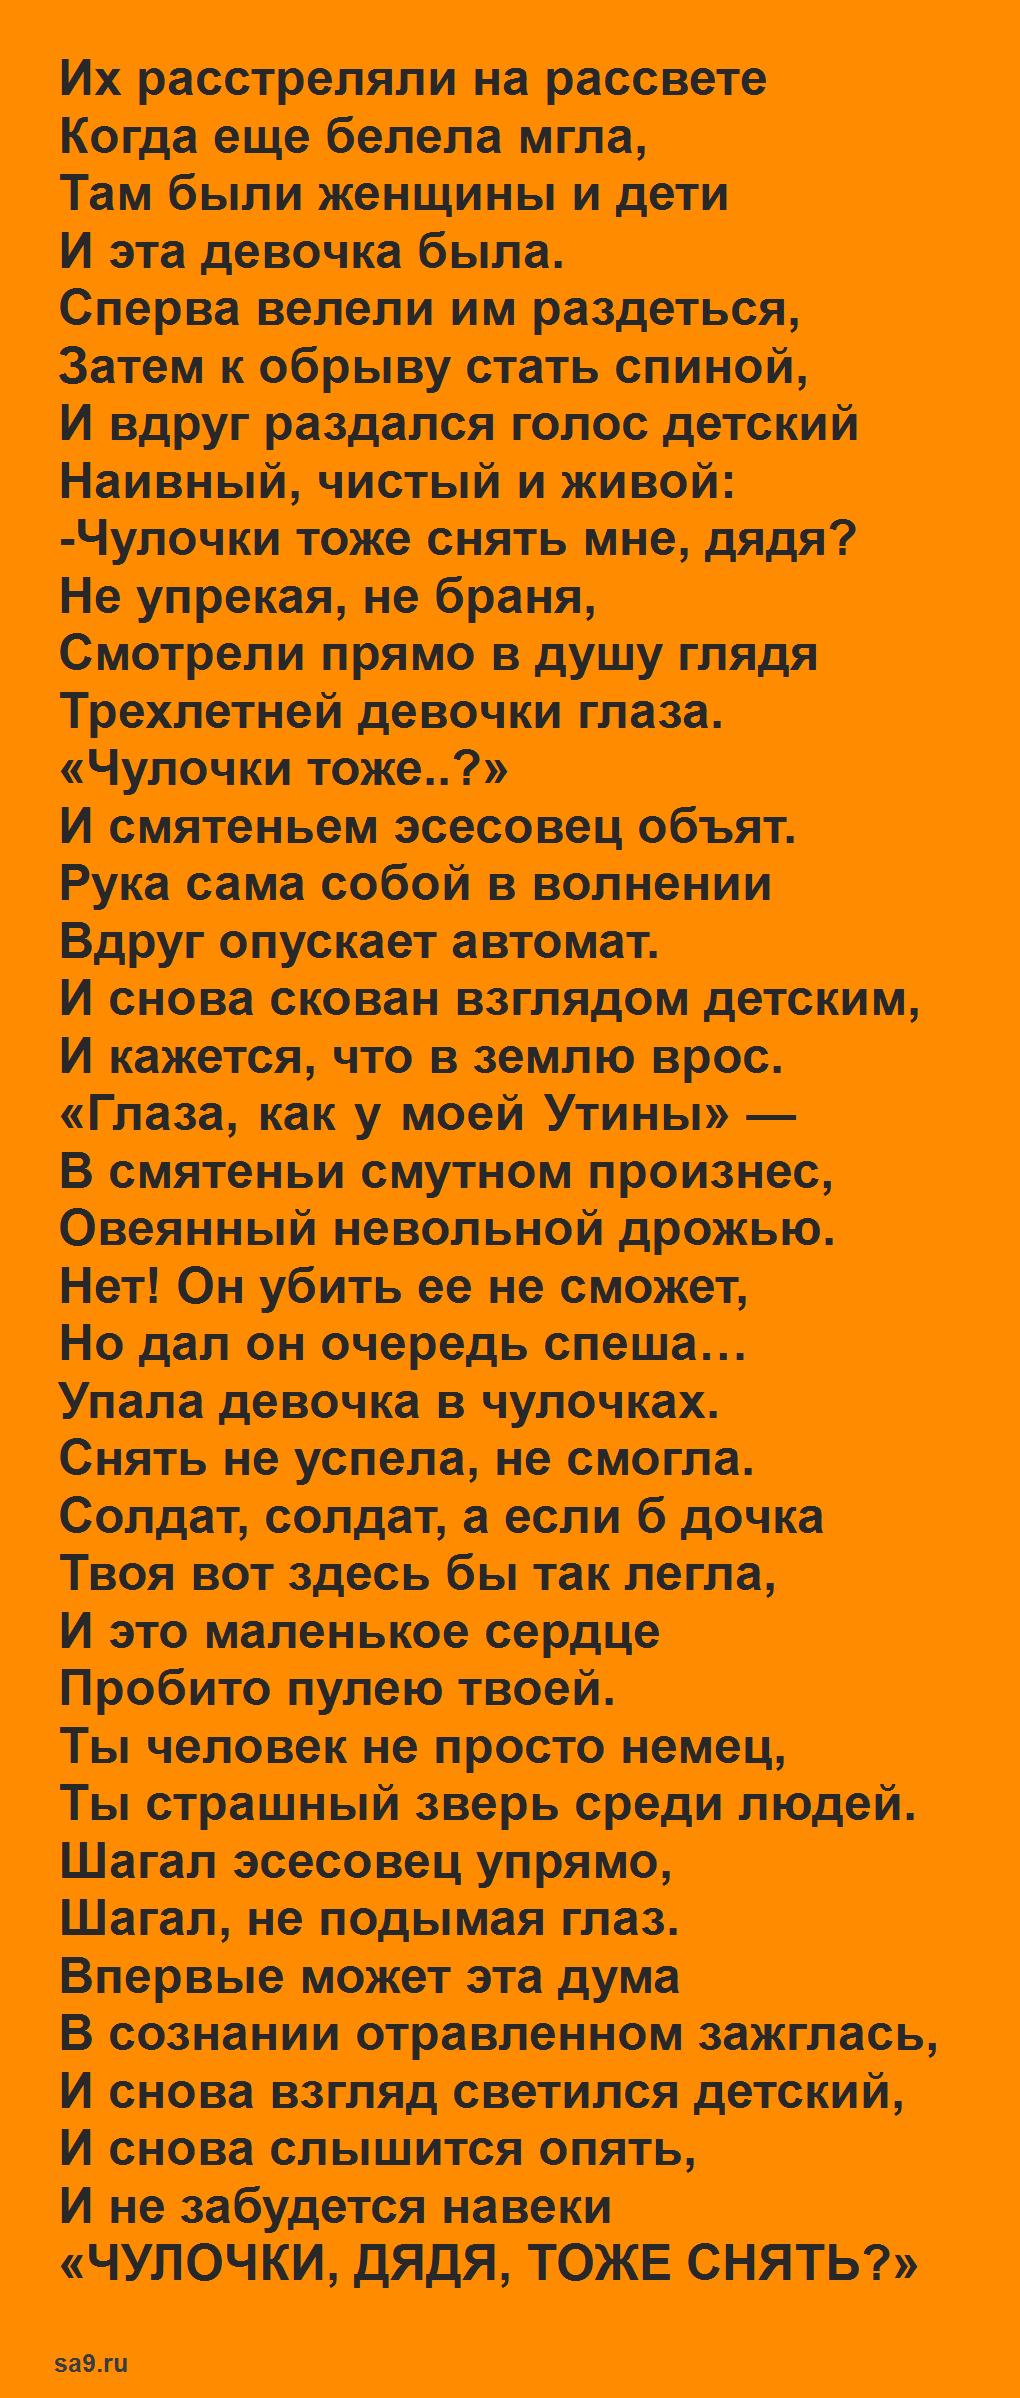 Чулочки - Муса Джалиль стих